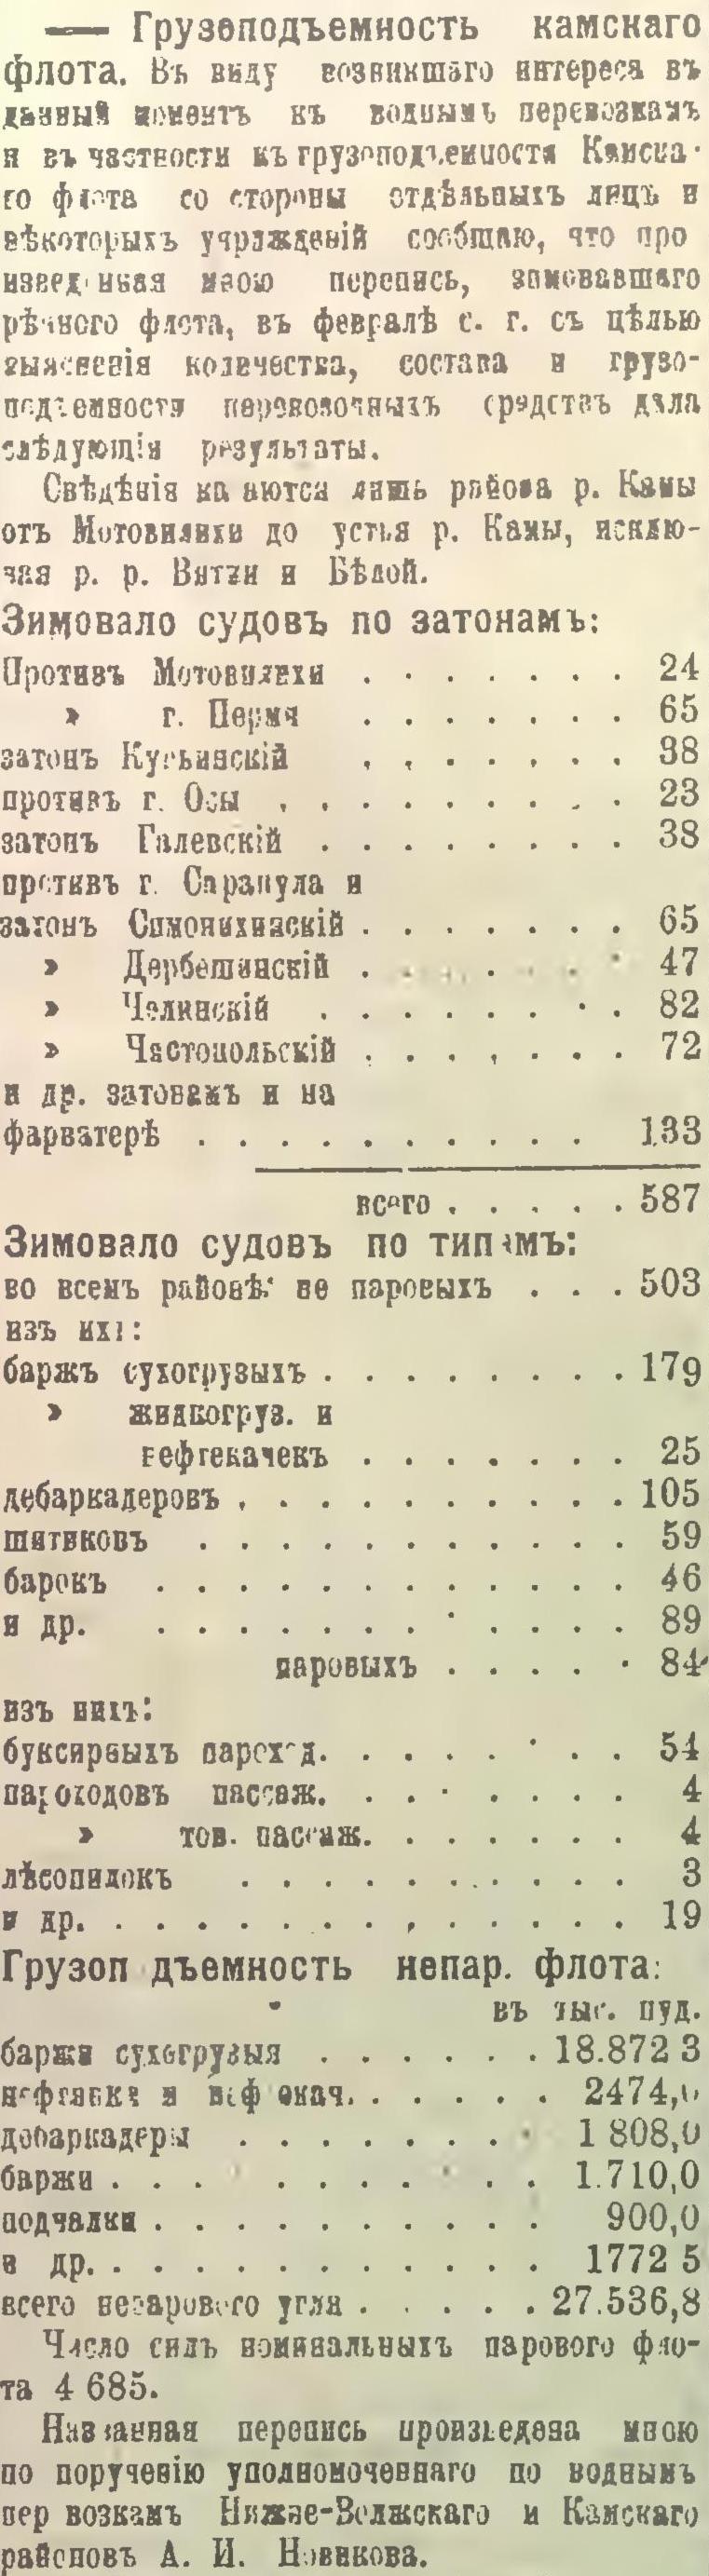 Грузоподъёмность камскаго флота. С. 3.jpg